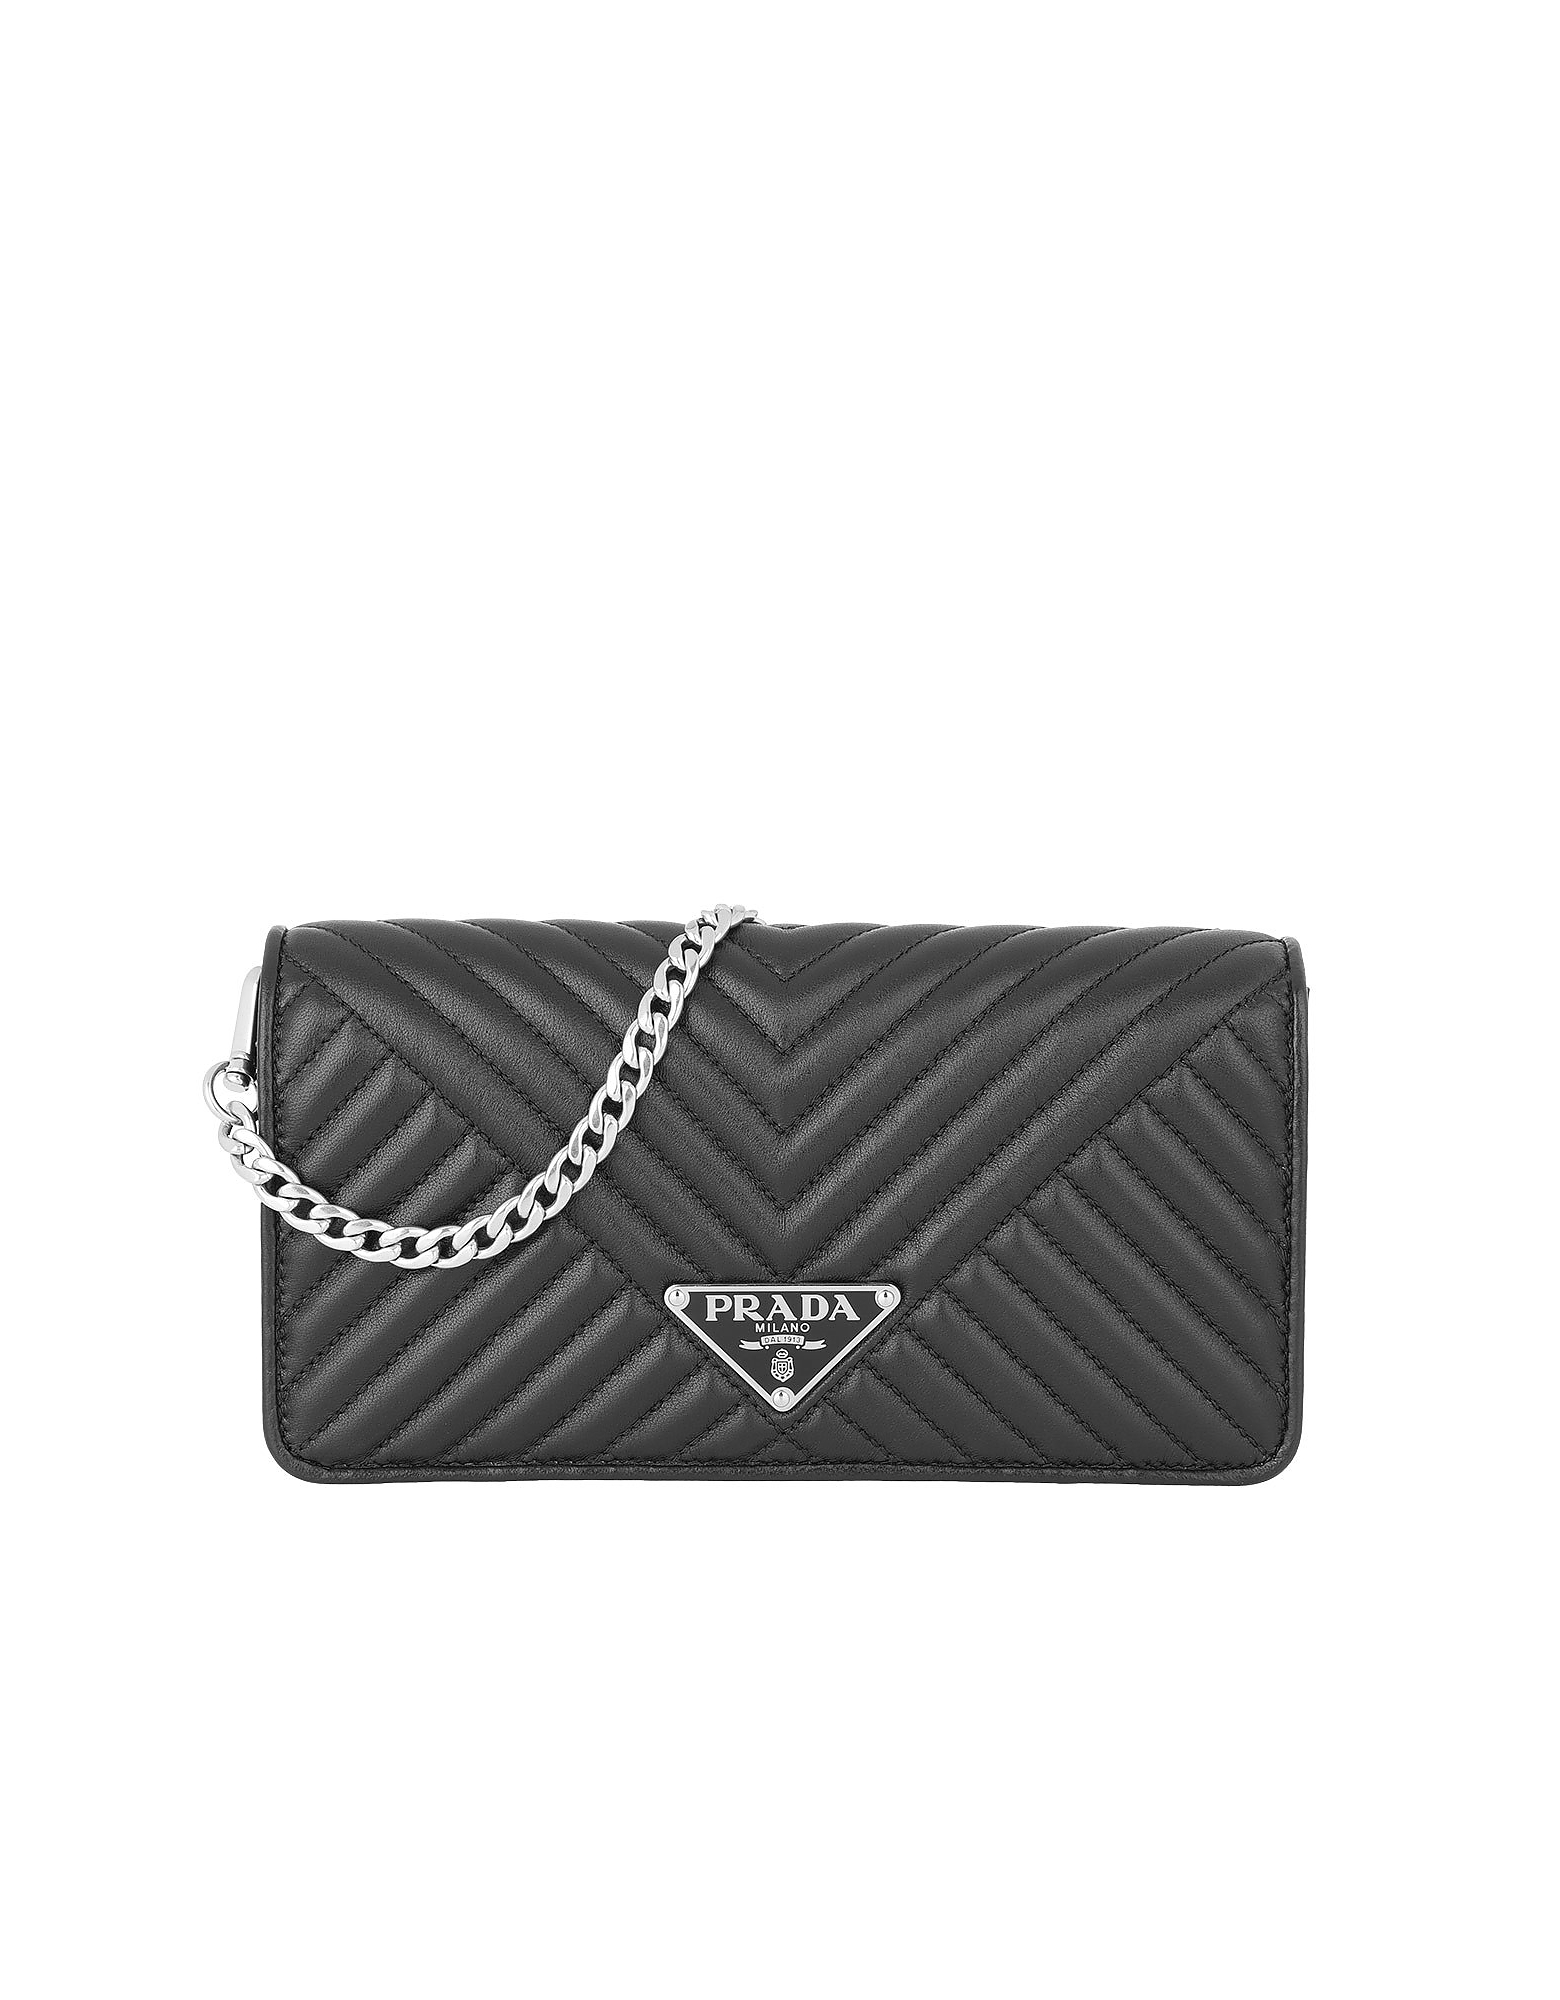 c53ae8bbc94f Prada Crossbody Bag Mini Black | ModeSens